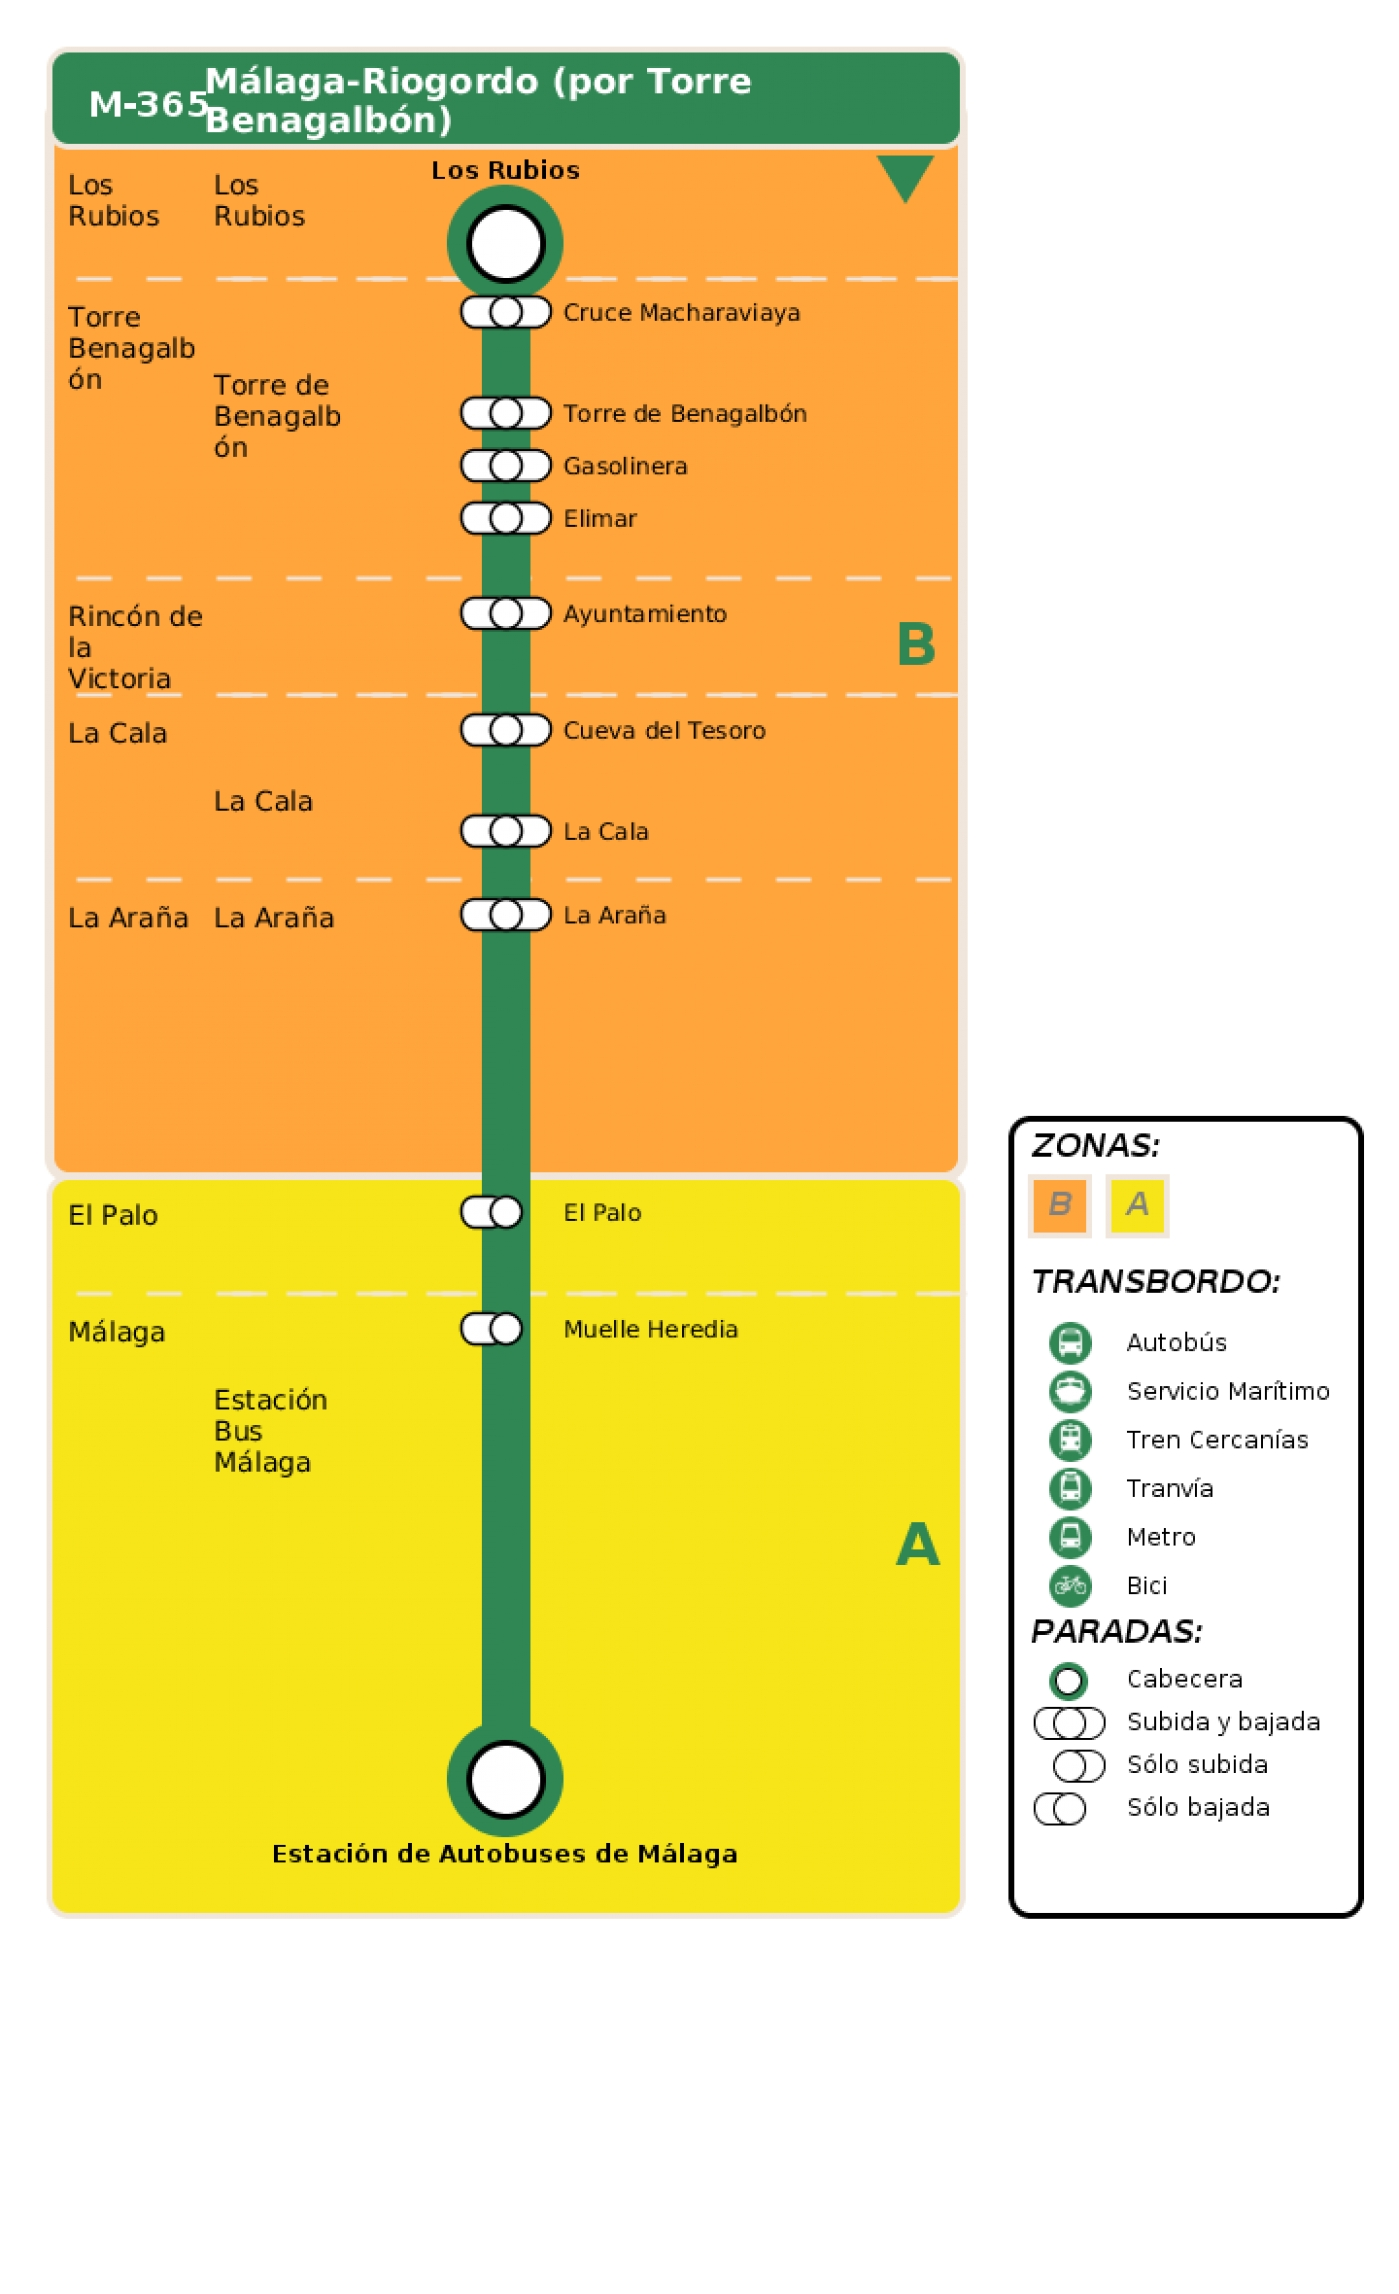 Recorrido esquemático, paradas y correspondencias en sentido vuelta Línea M-365: Málaga - Riogordo